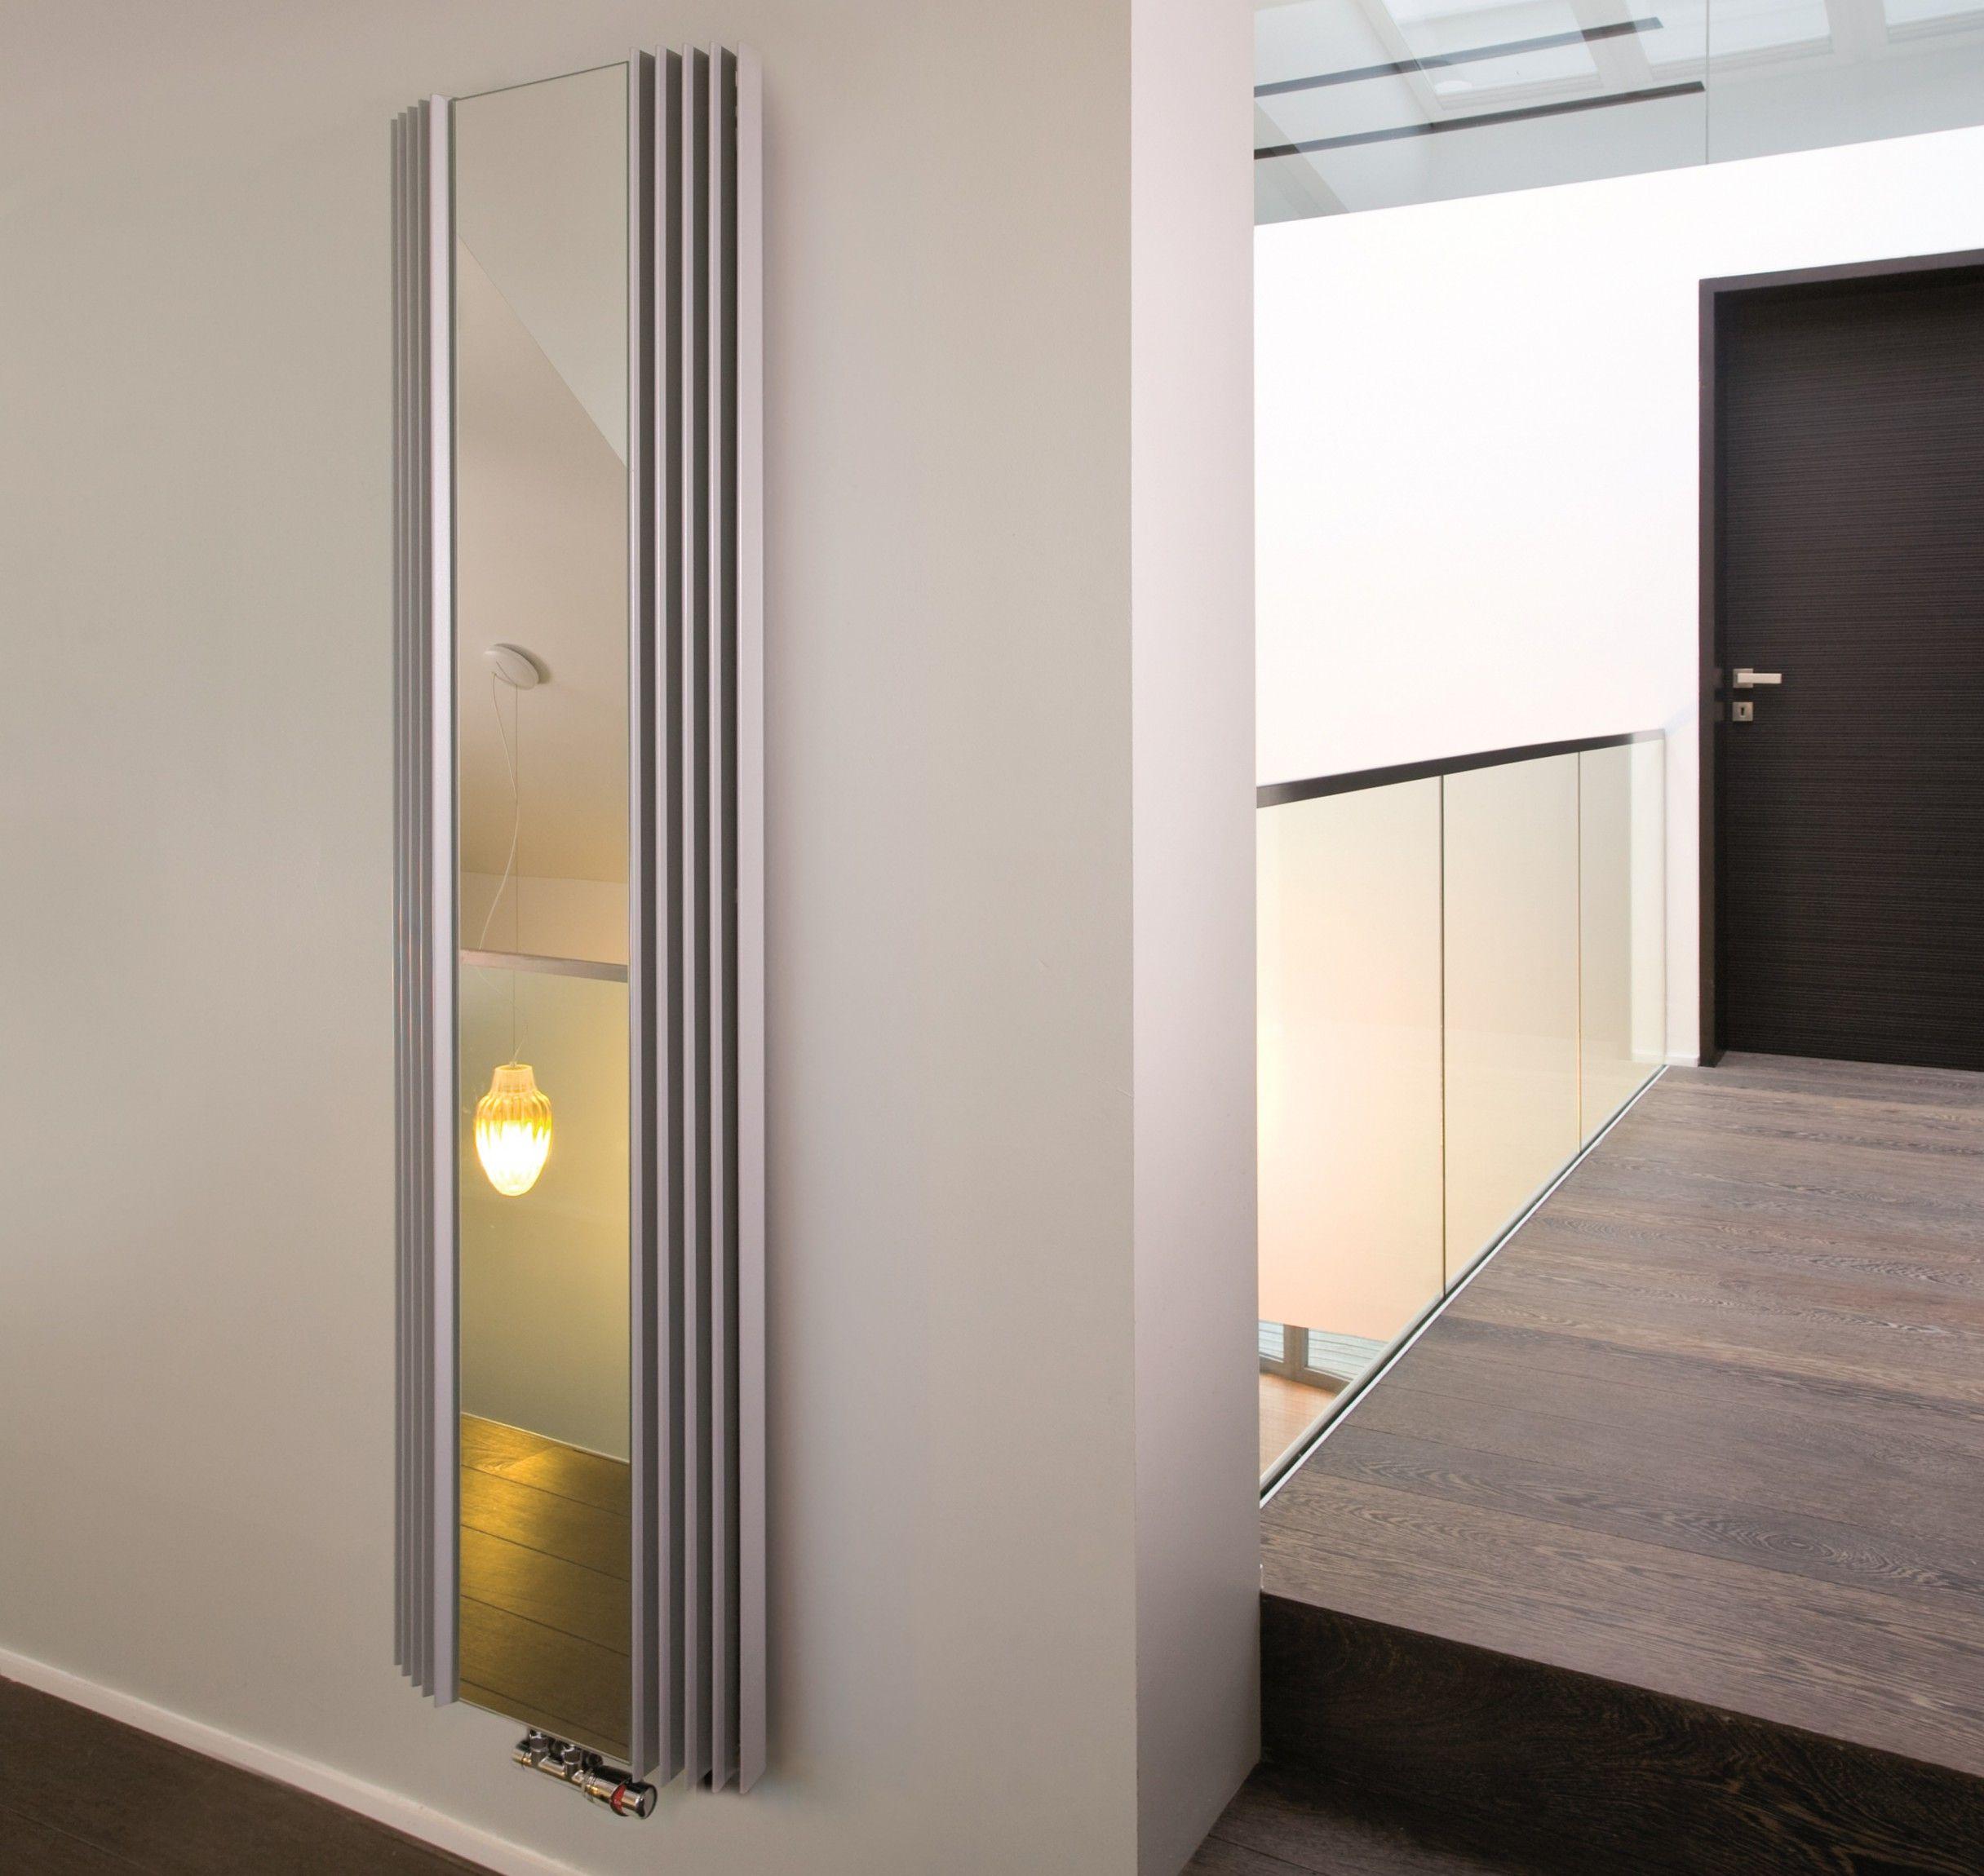 design heizkörper spiegel 200 x ab 51 cm ab 978 watt heizkörper ...